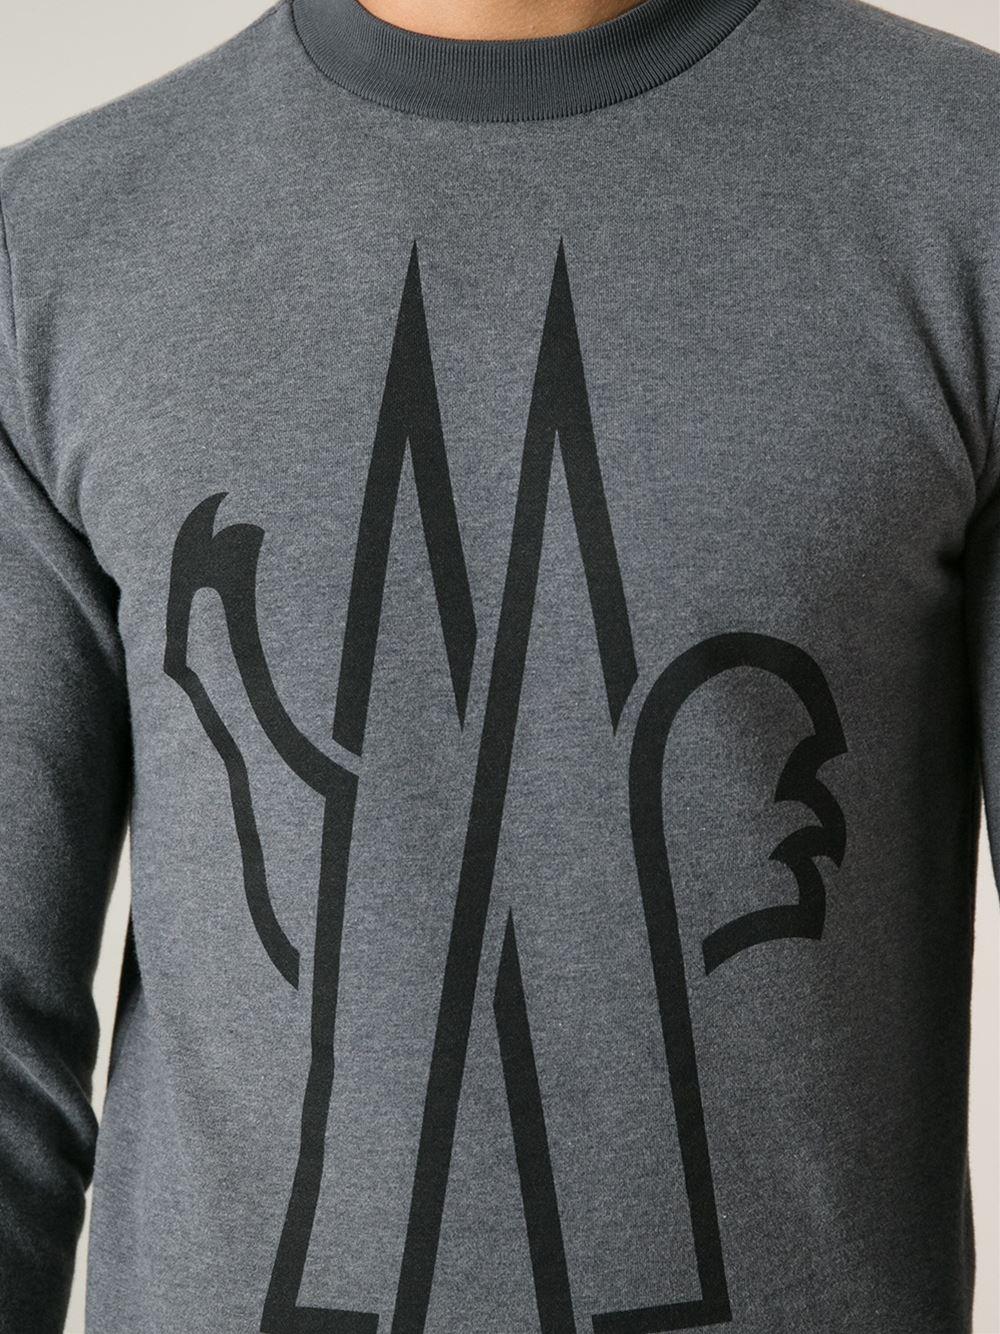 7c0604871c12 Moncler Grenoble Logo Sweatshirt in Gray for Men - Lyst